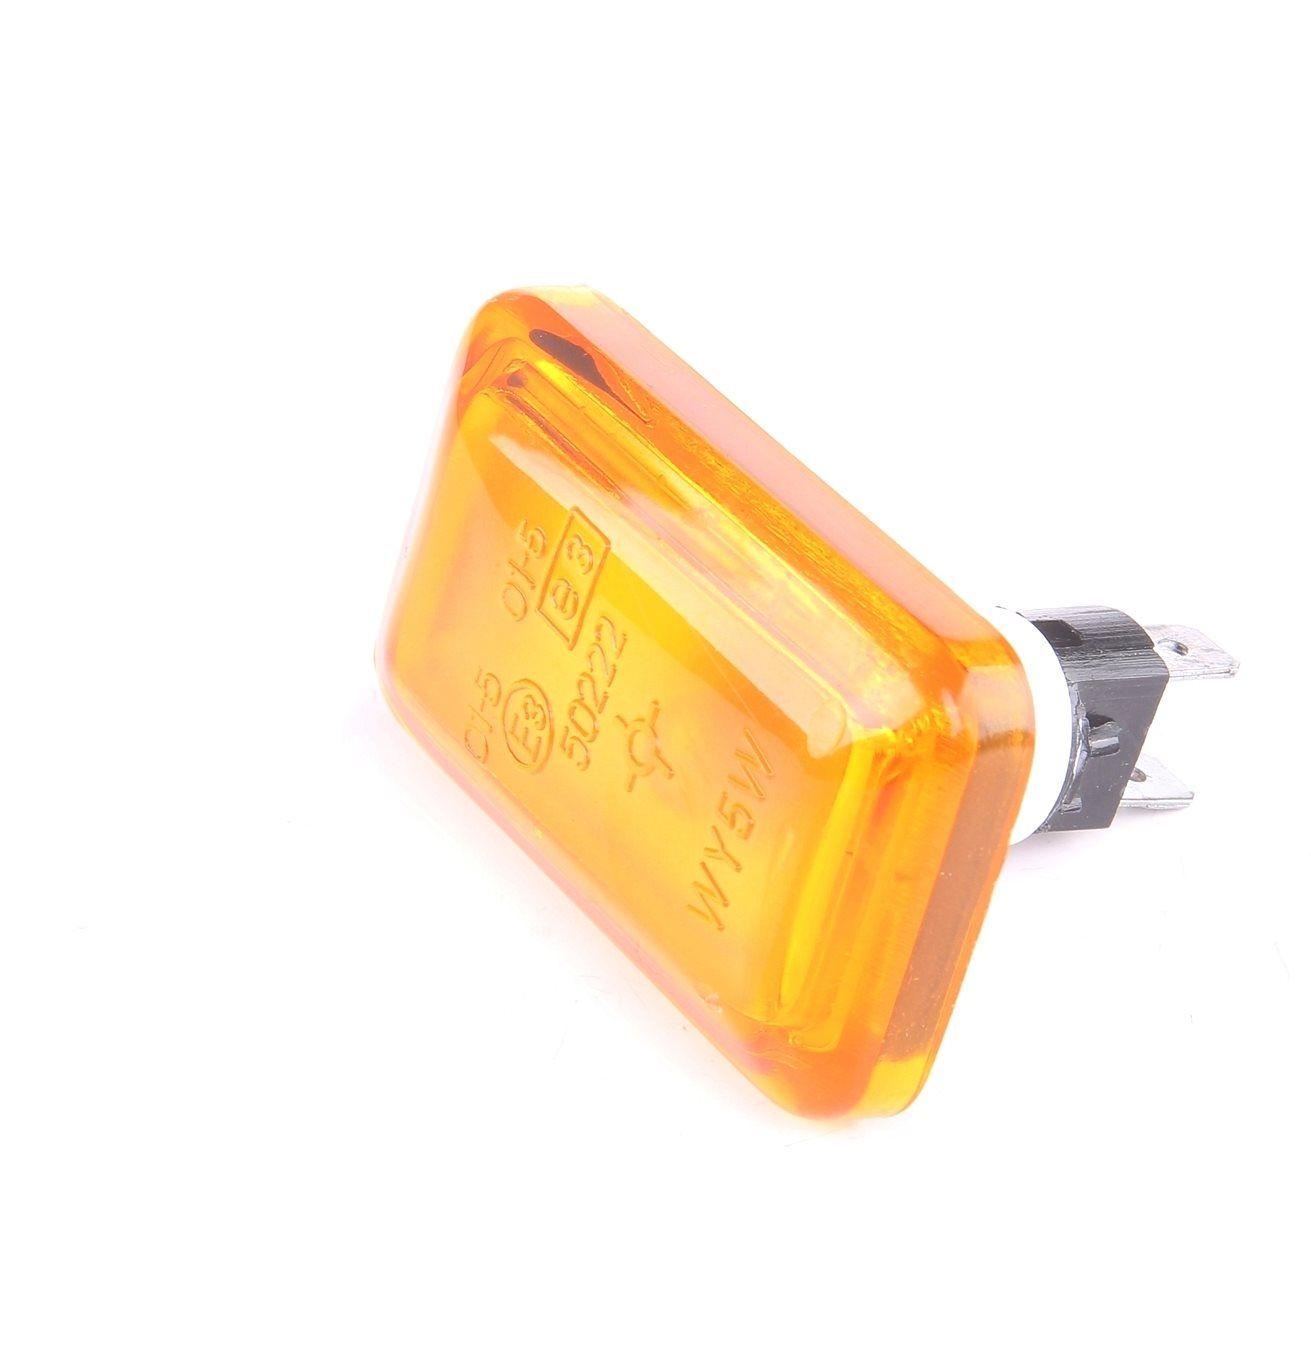 Blinklicht VAN WEZEL 5812914 Bewertung